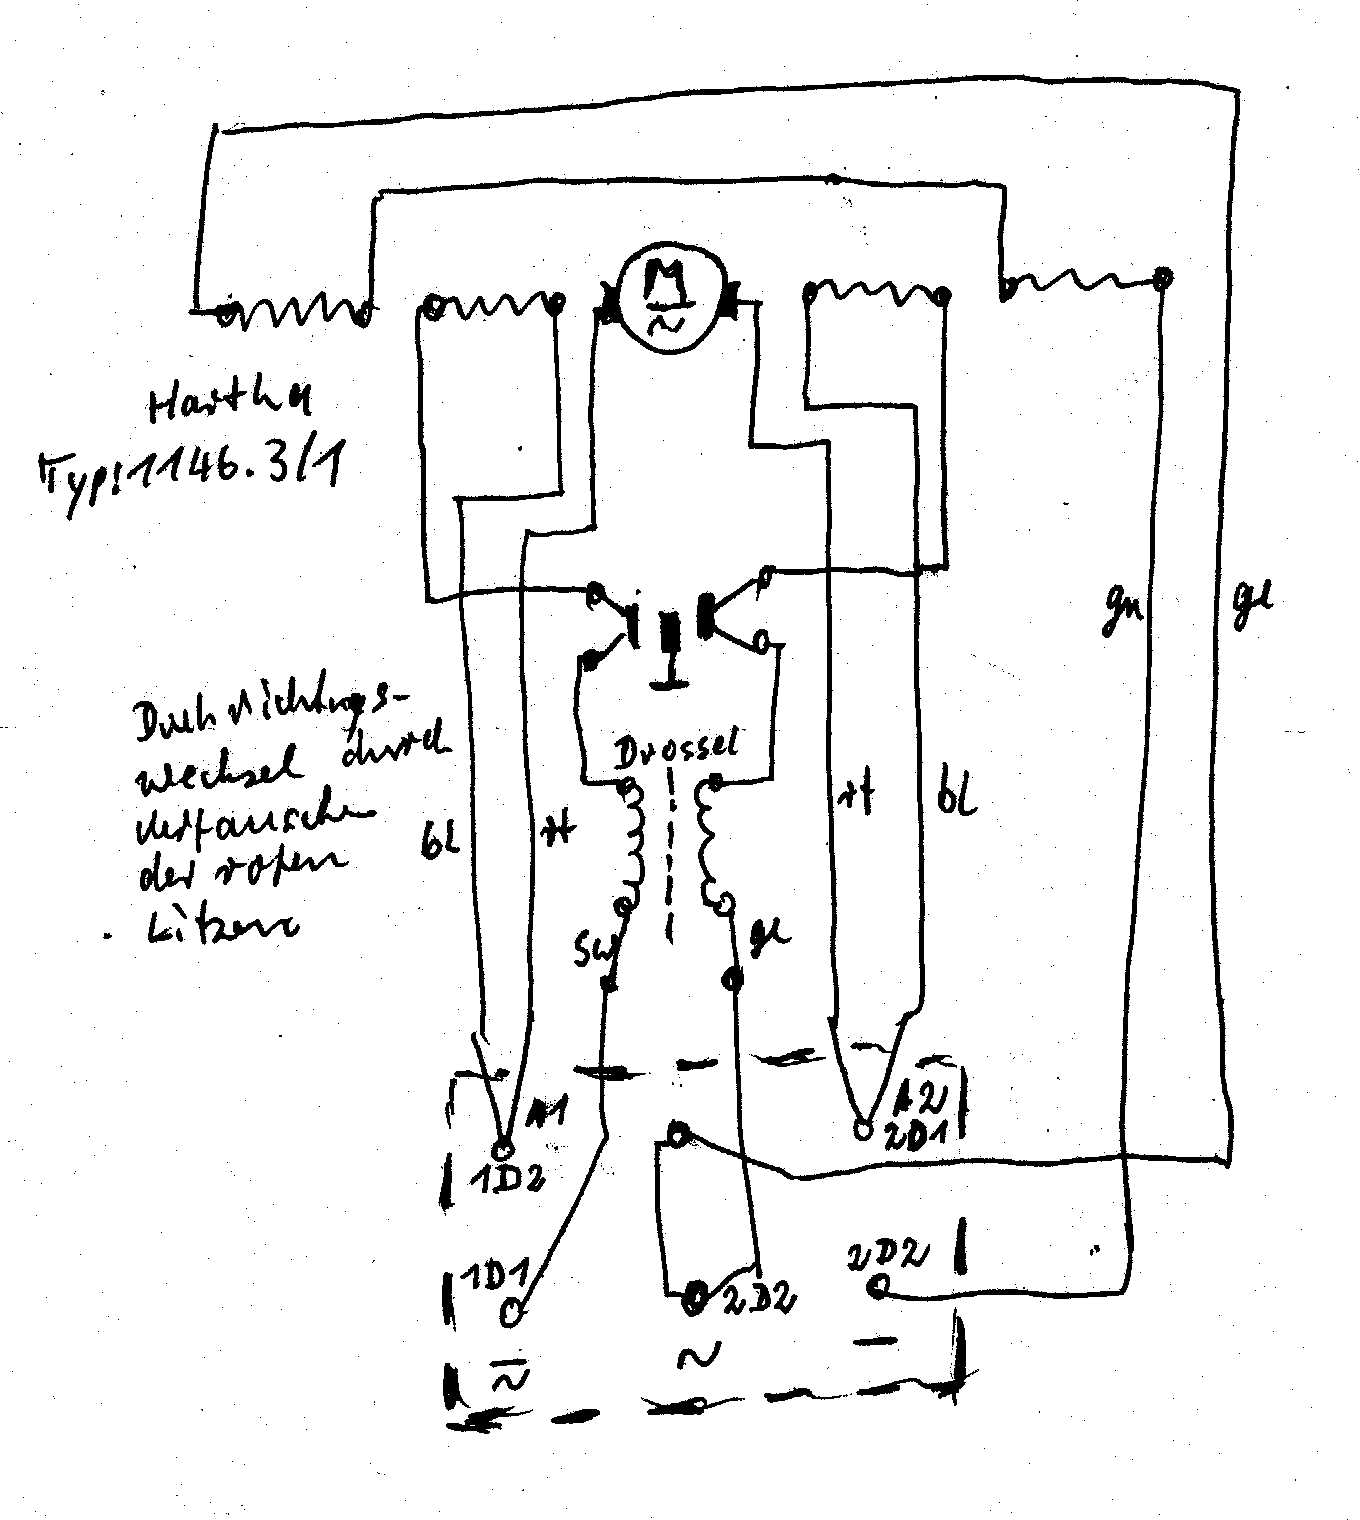 Elektromotor 200W ELMO Hartha - Mikrocontroller.net